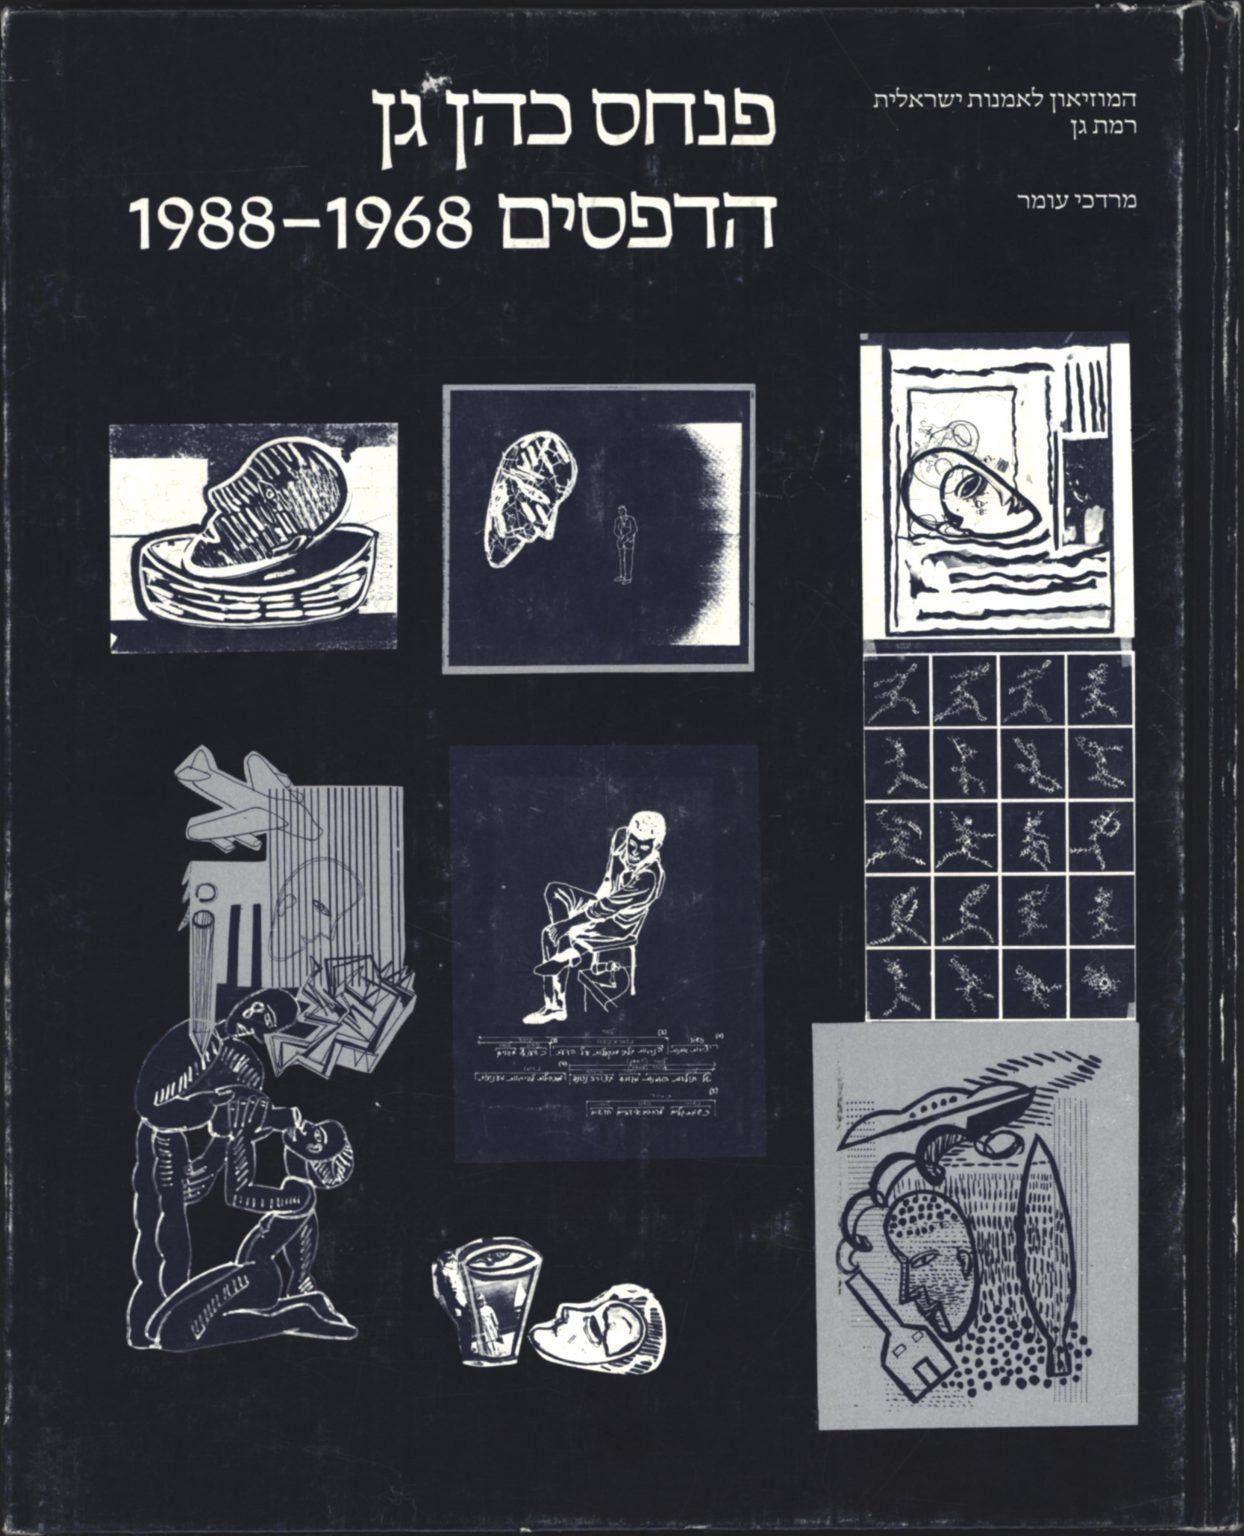 Mordechai Omer, Pinchas Cohen Gan: Prints 1968-1988, The Museum of Israeli Art, Ramat Gan, 1988